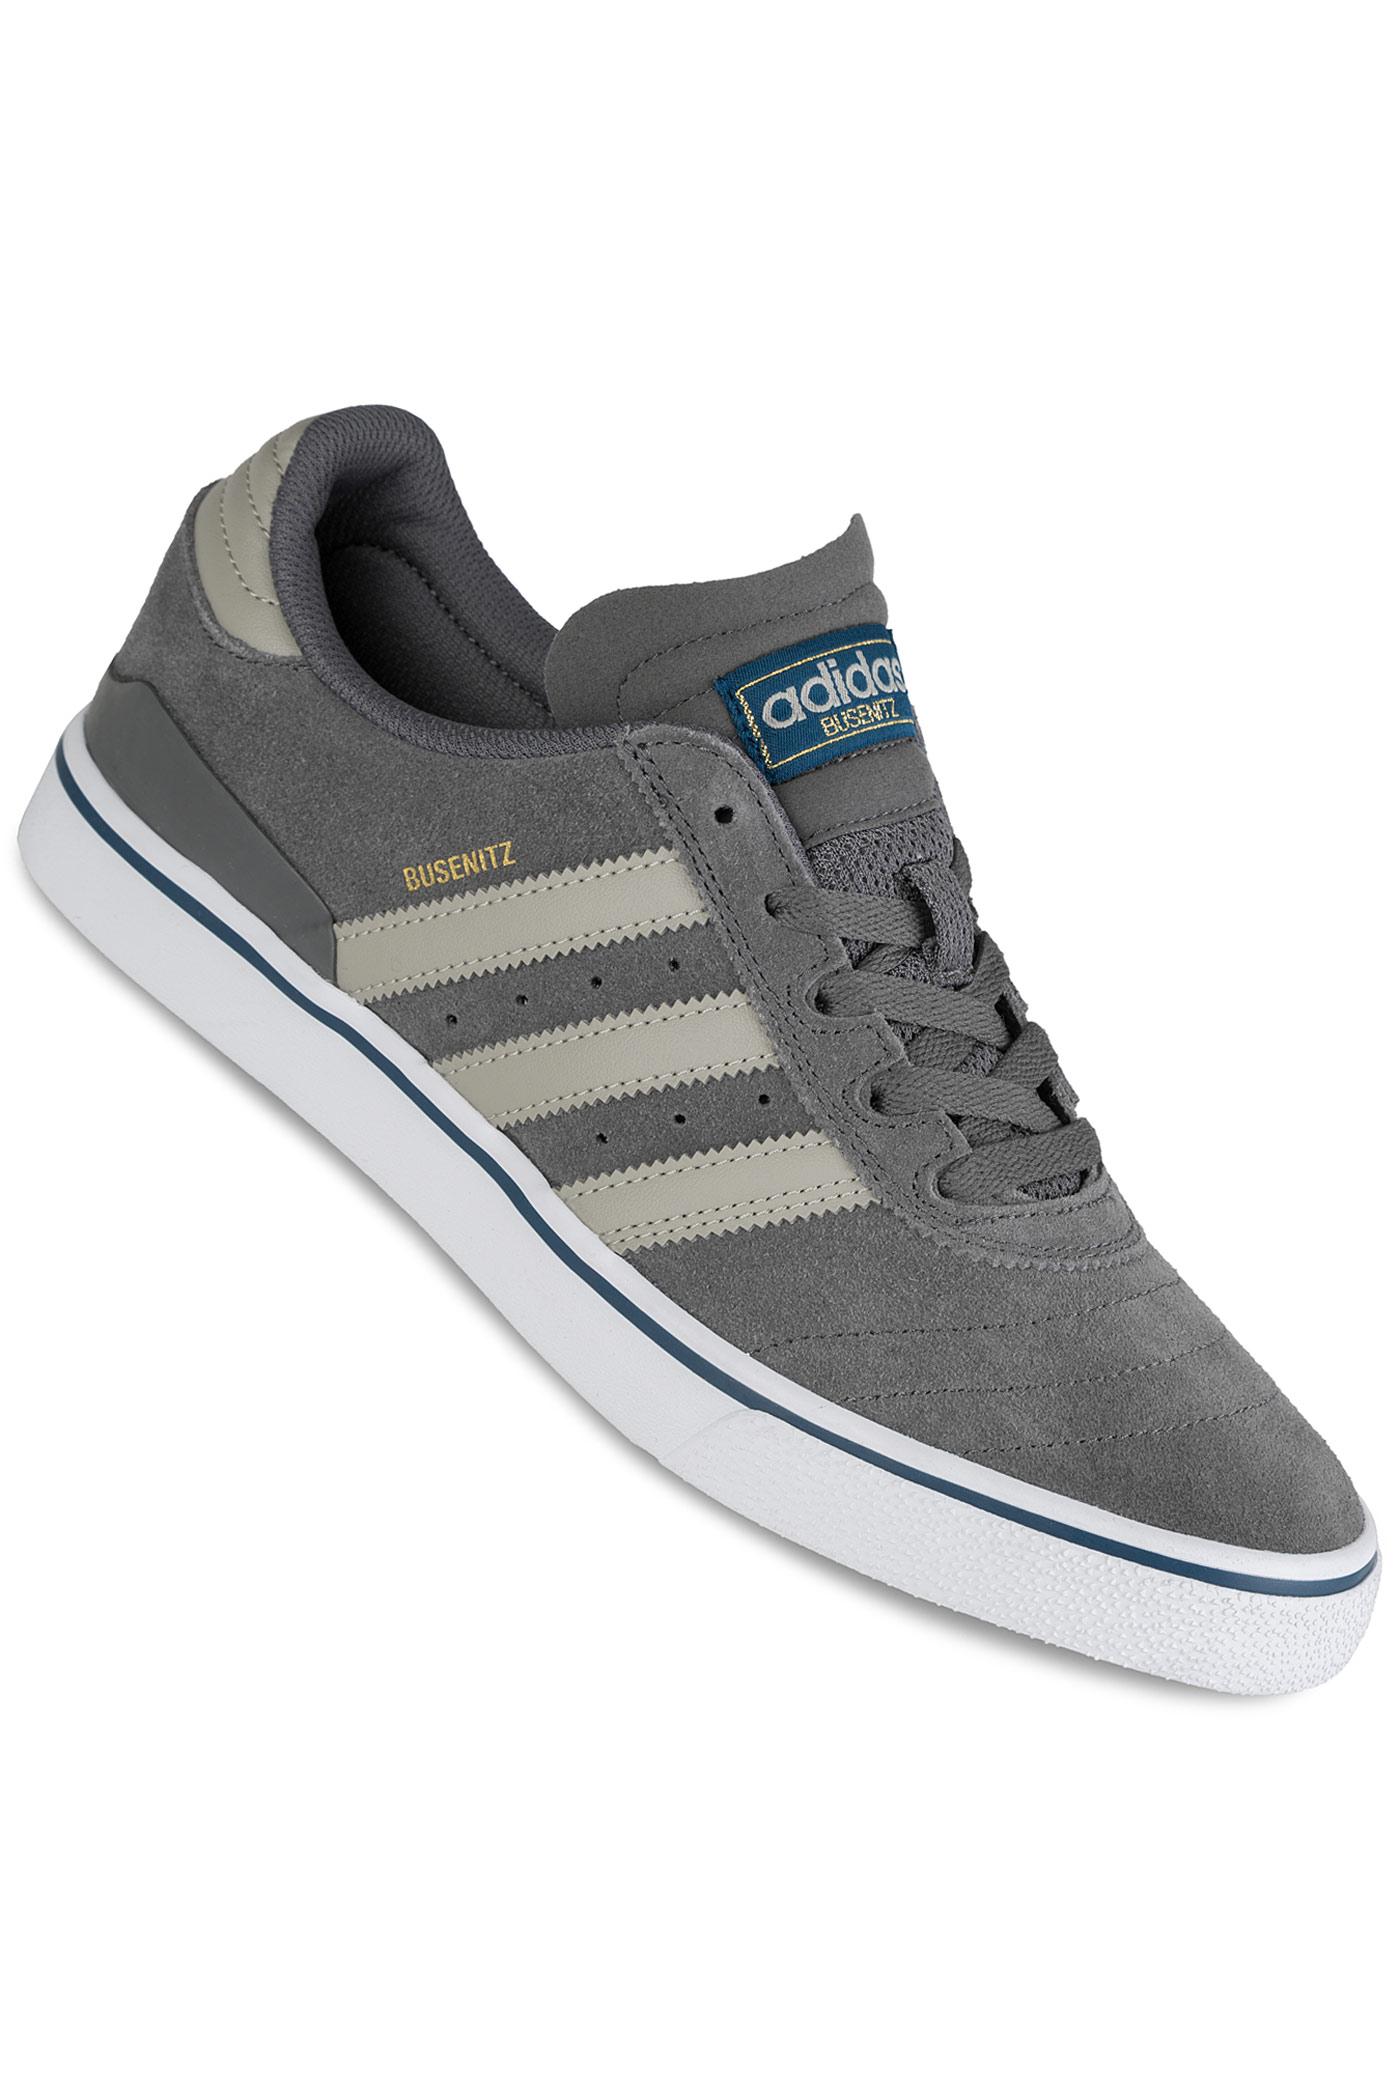 ... adidas Skateboarding Busenitz Vulc ADV Schoen (brown white burgundy) ...